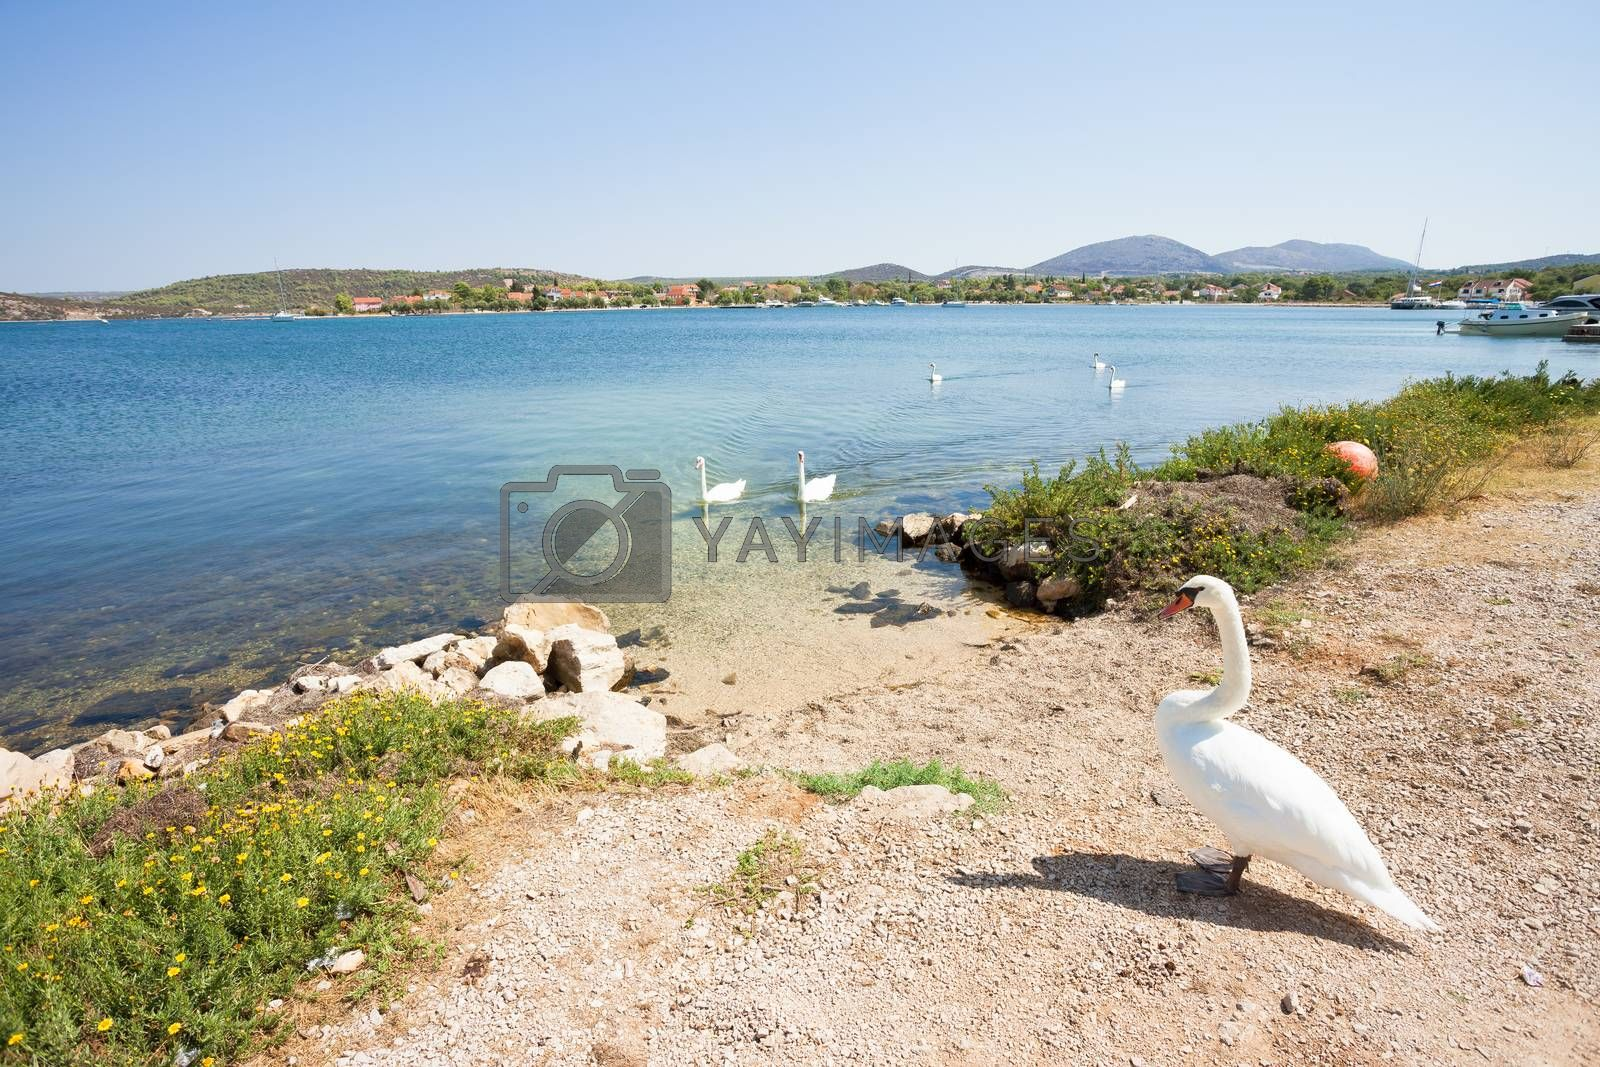 Bilice, Sibenik-Knin, Croatia, Europe - A swan cob waiting for its family at the beach